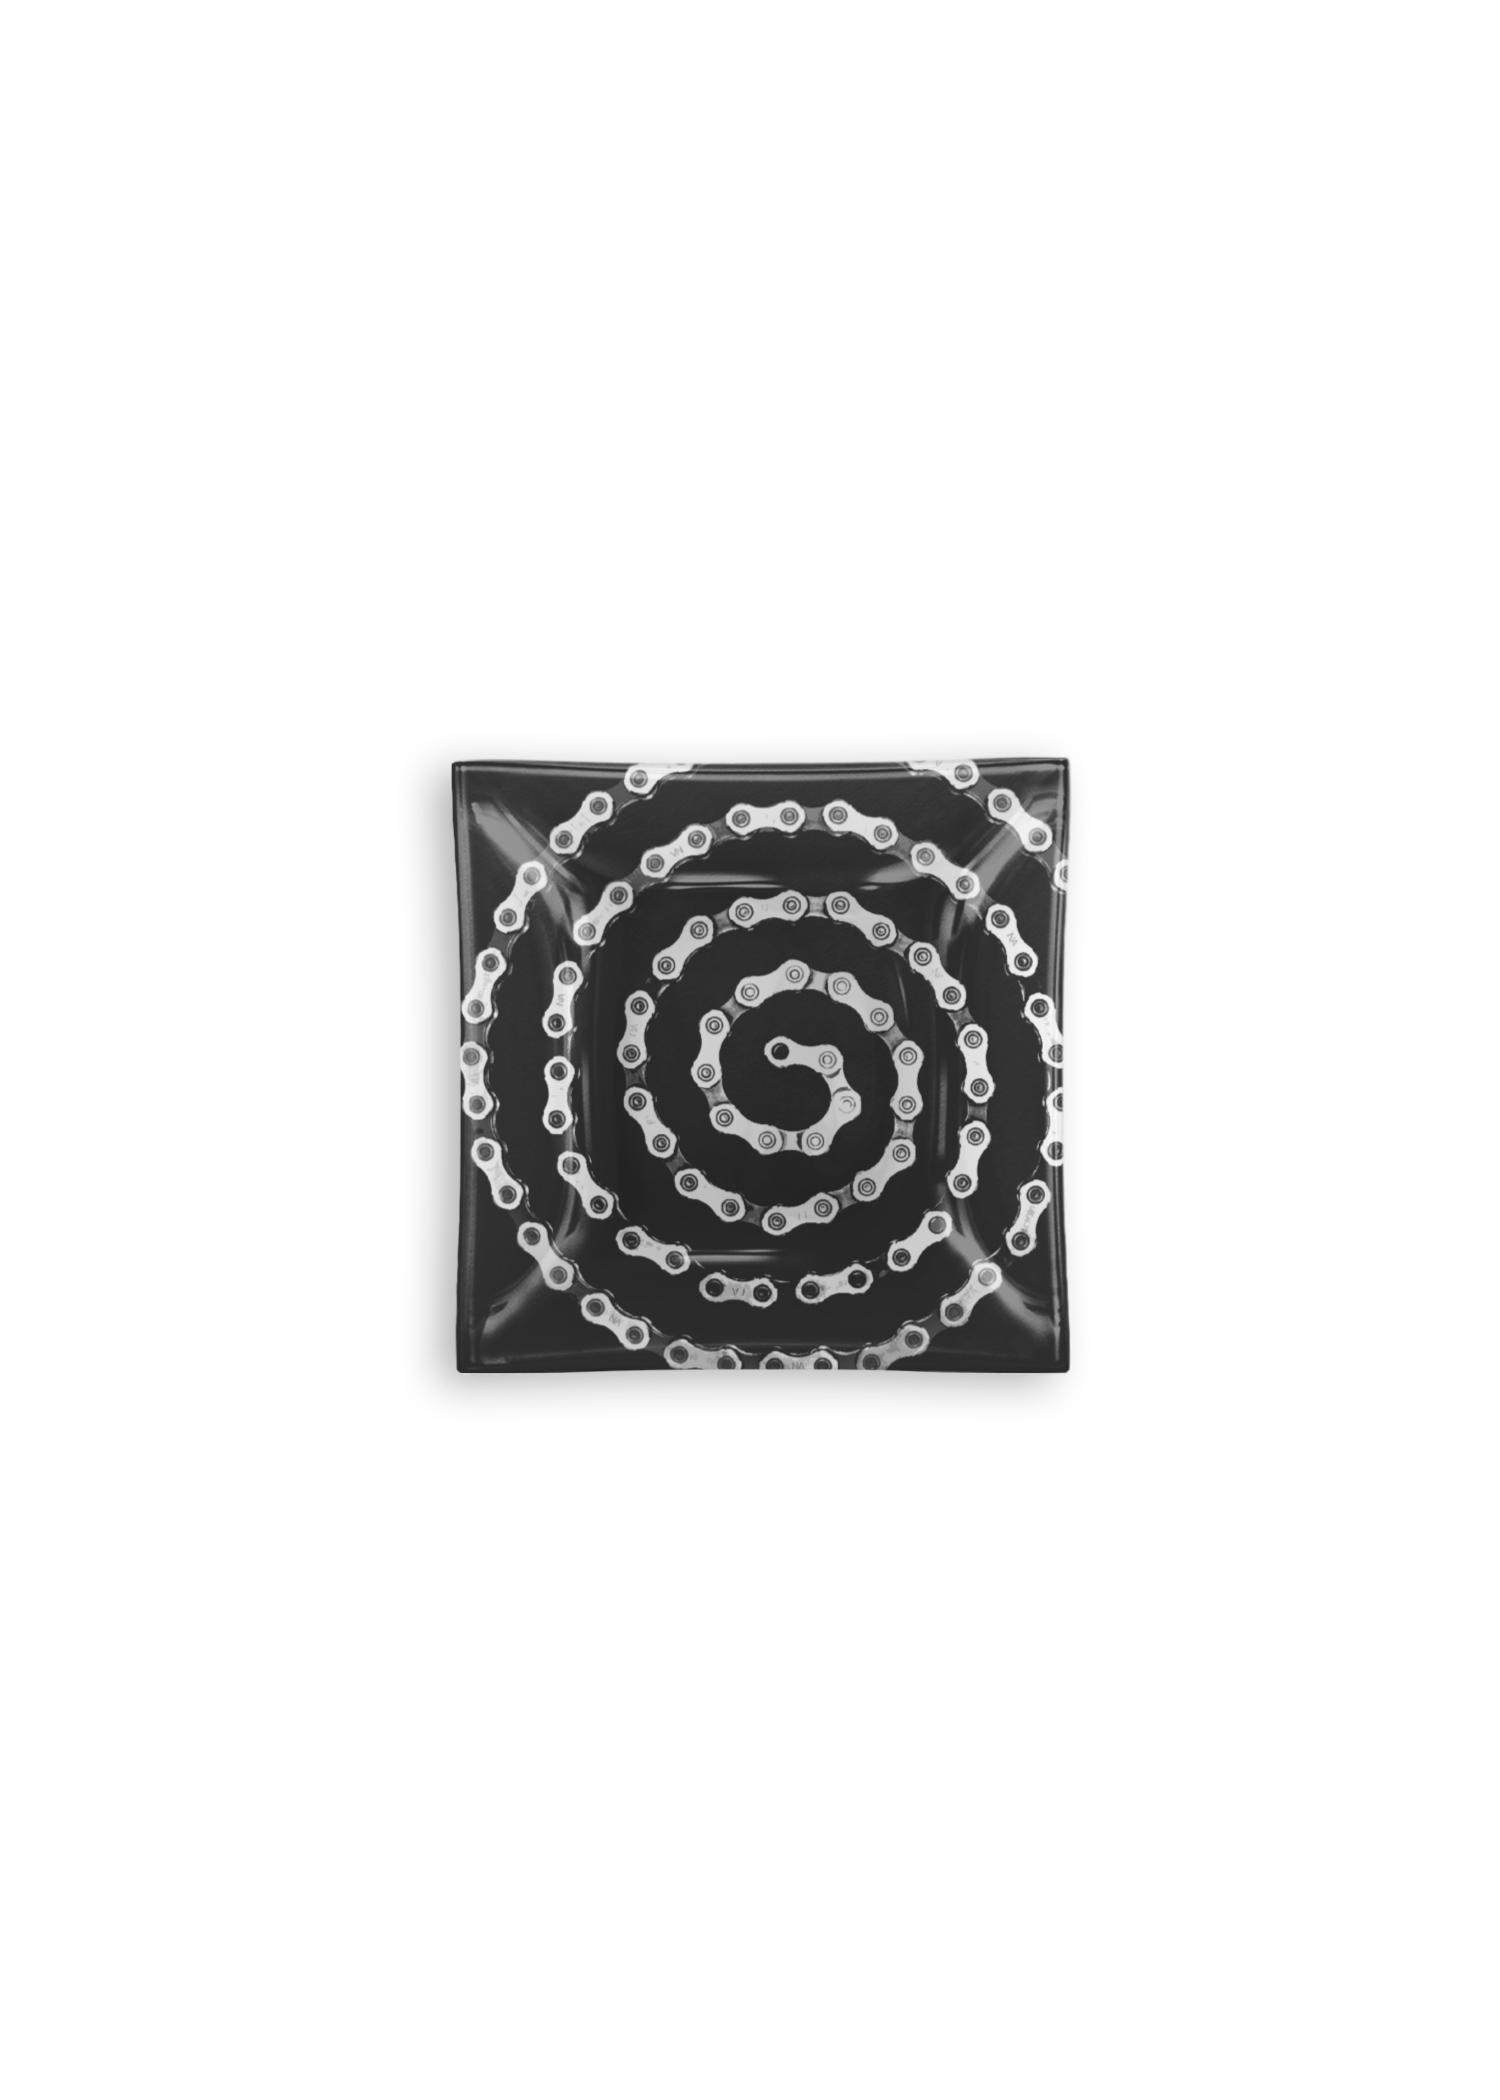 VIDA Square Glass Tray - Bike Chain Spiral by VIDA Original Artist  - Size: Small